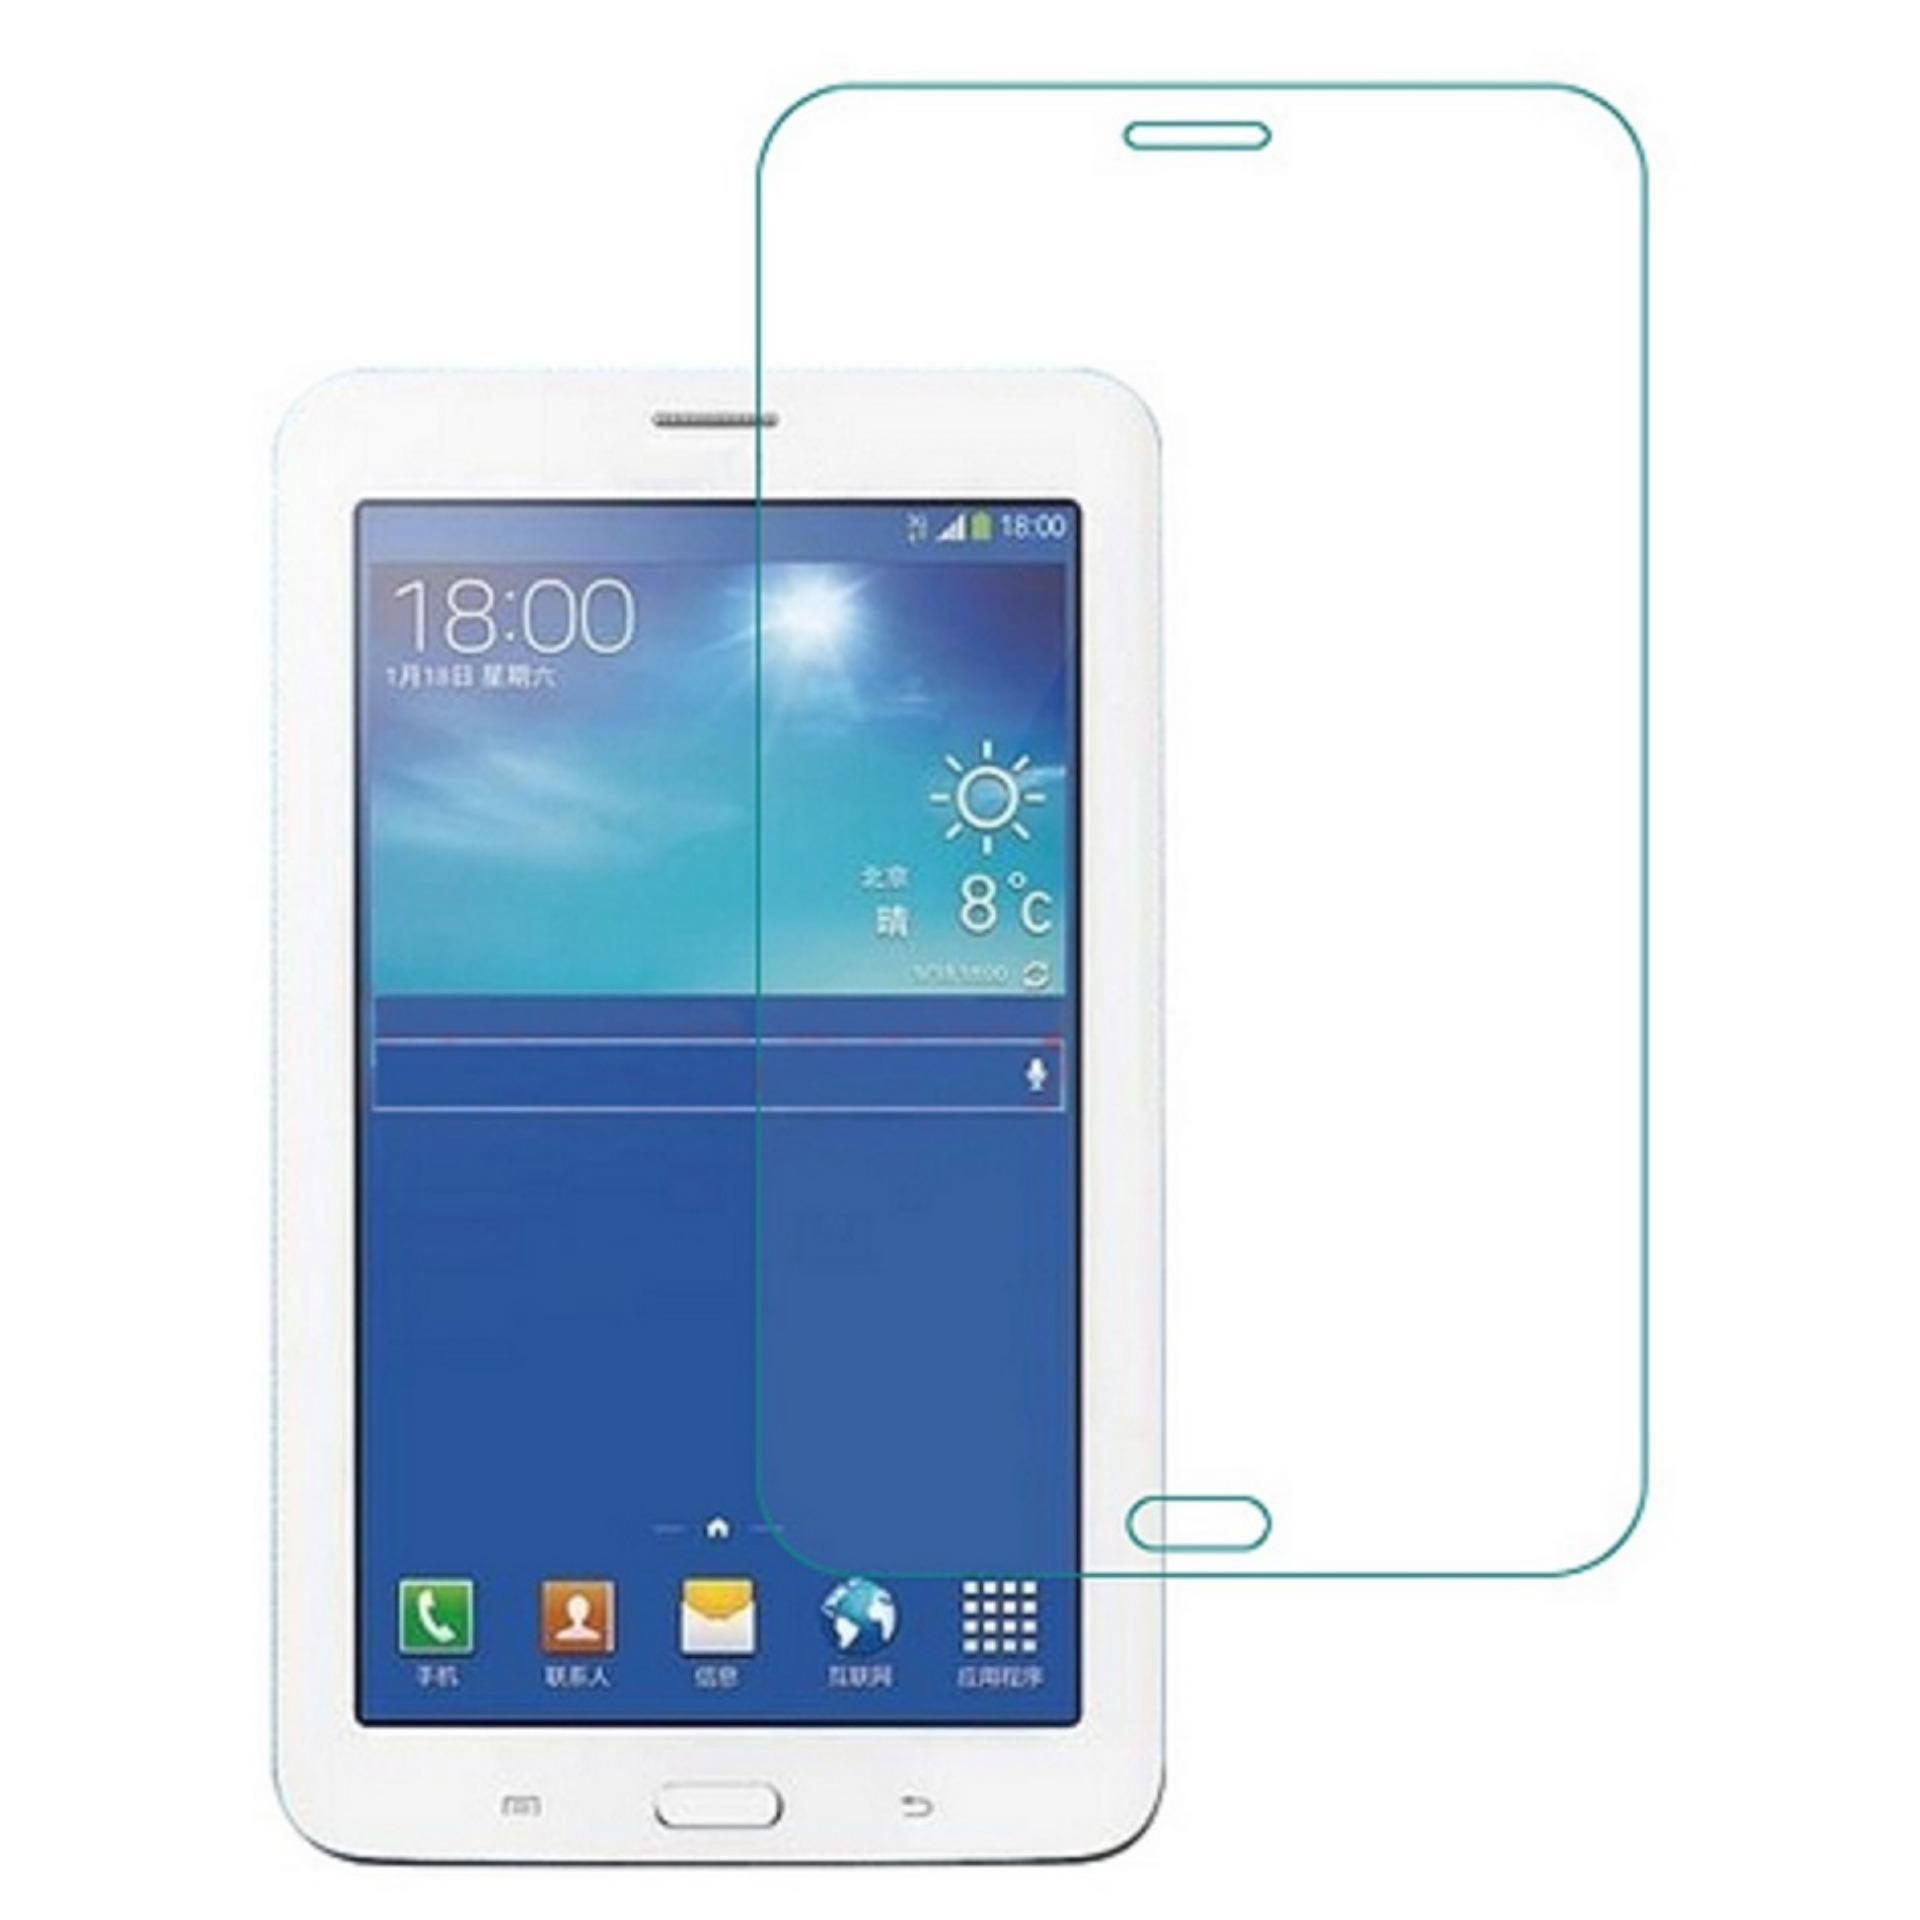 Vn Samsung Galaxy Tablet Tab 3 Lite 7.0